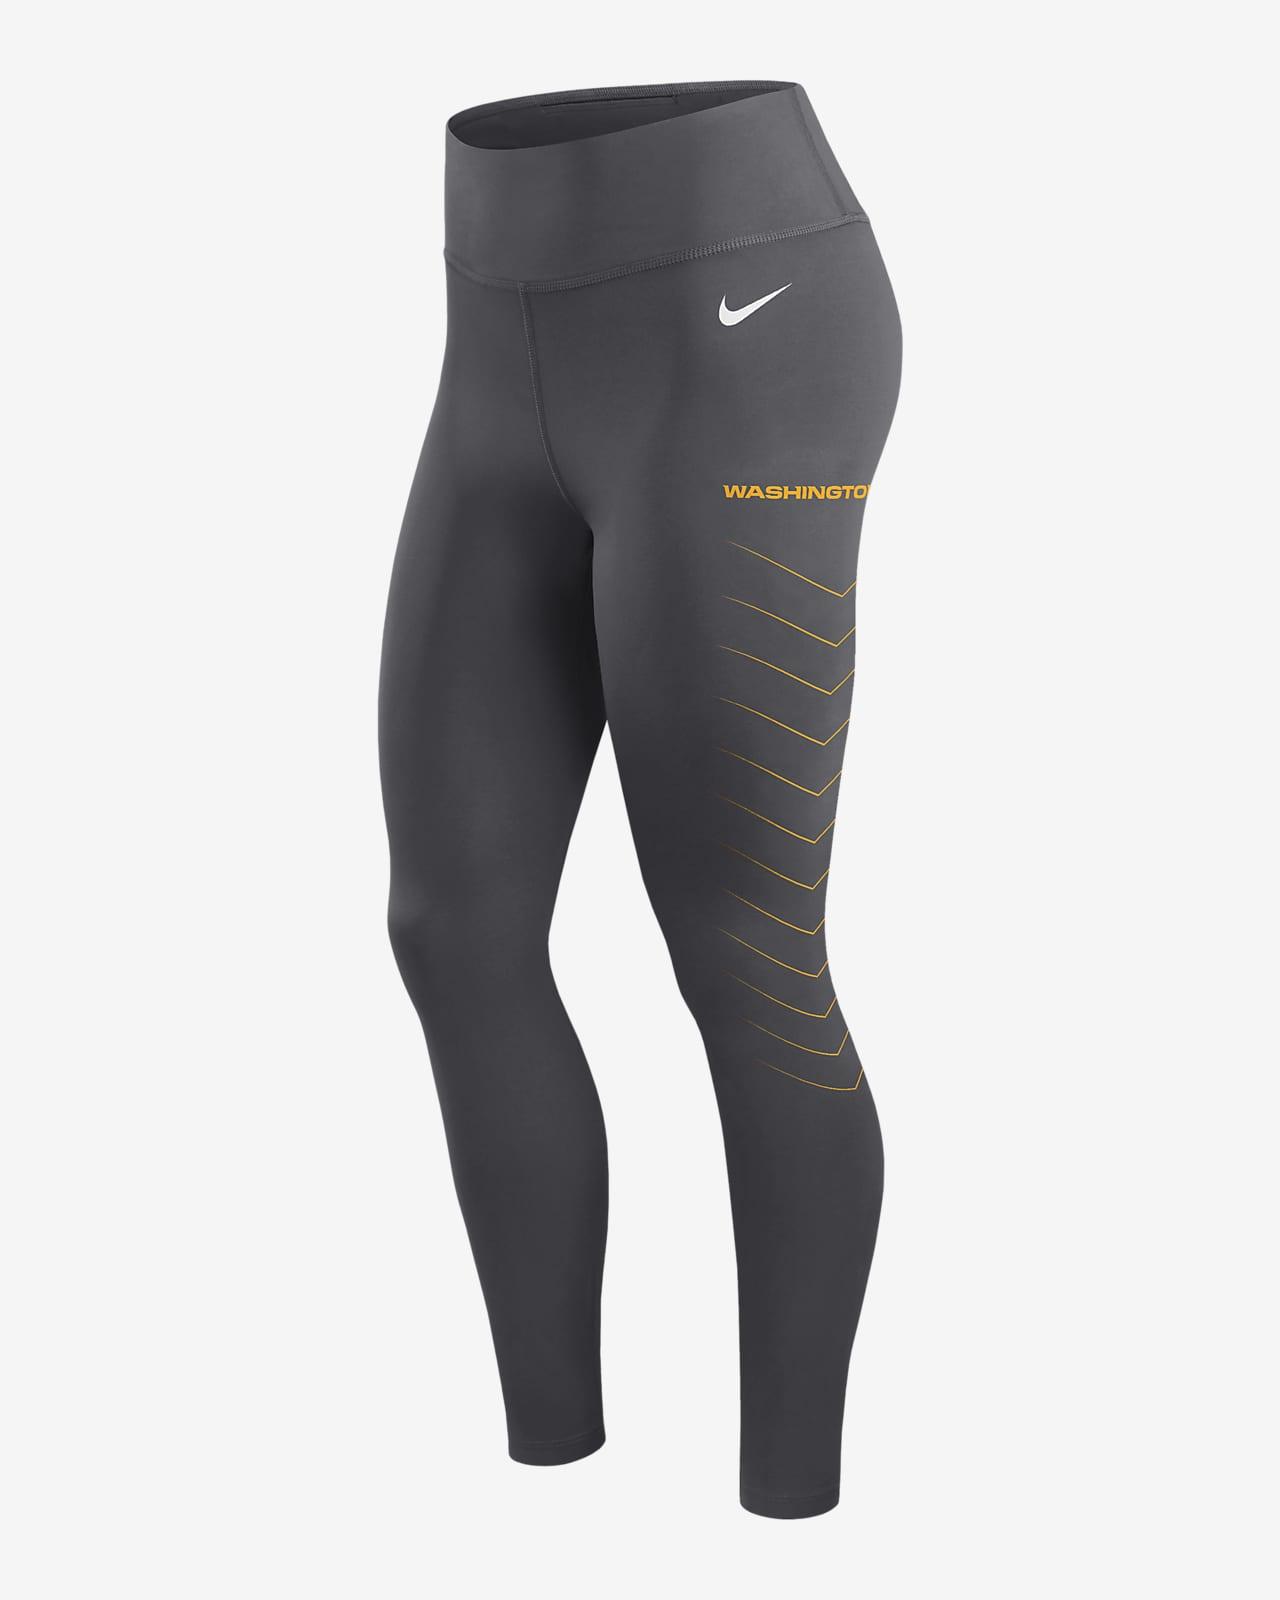 Leggings para mujer Nike Dri-FIT (NFL Washington Football Team)